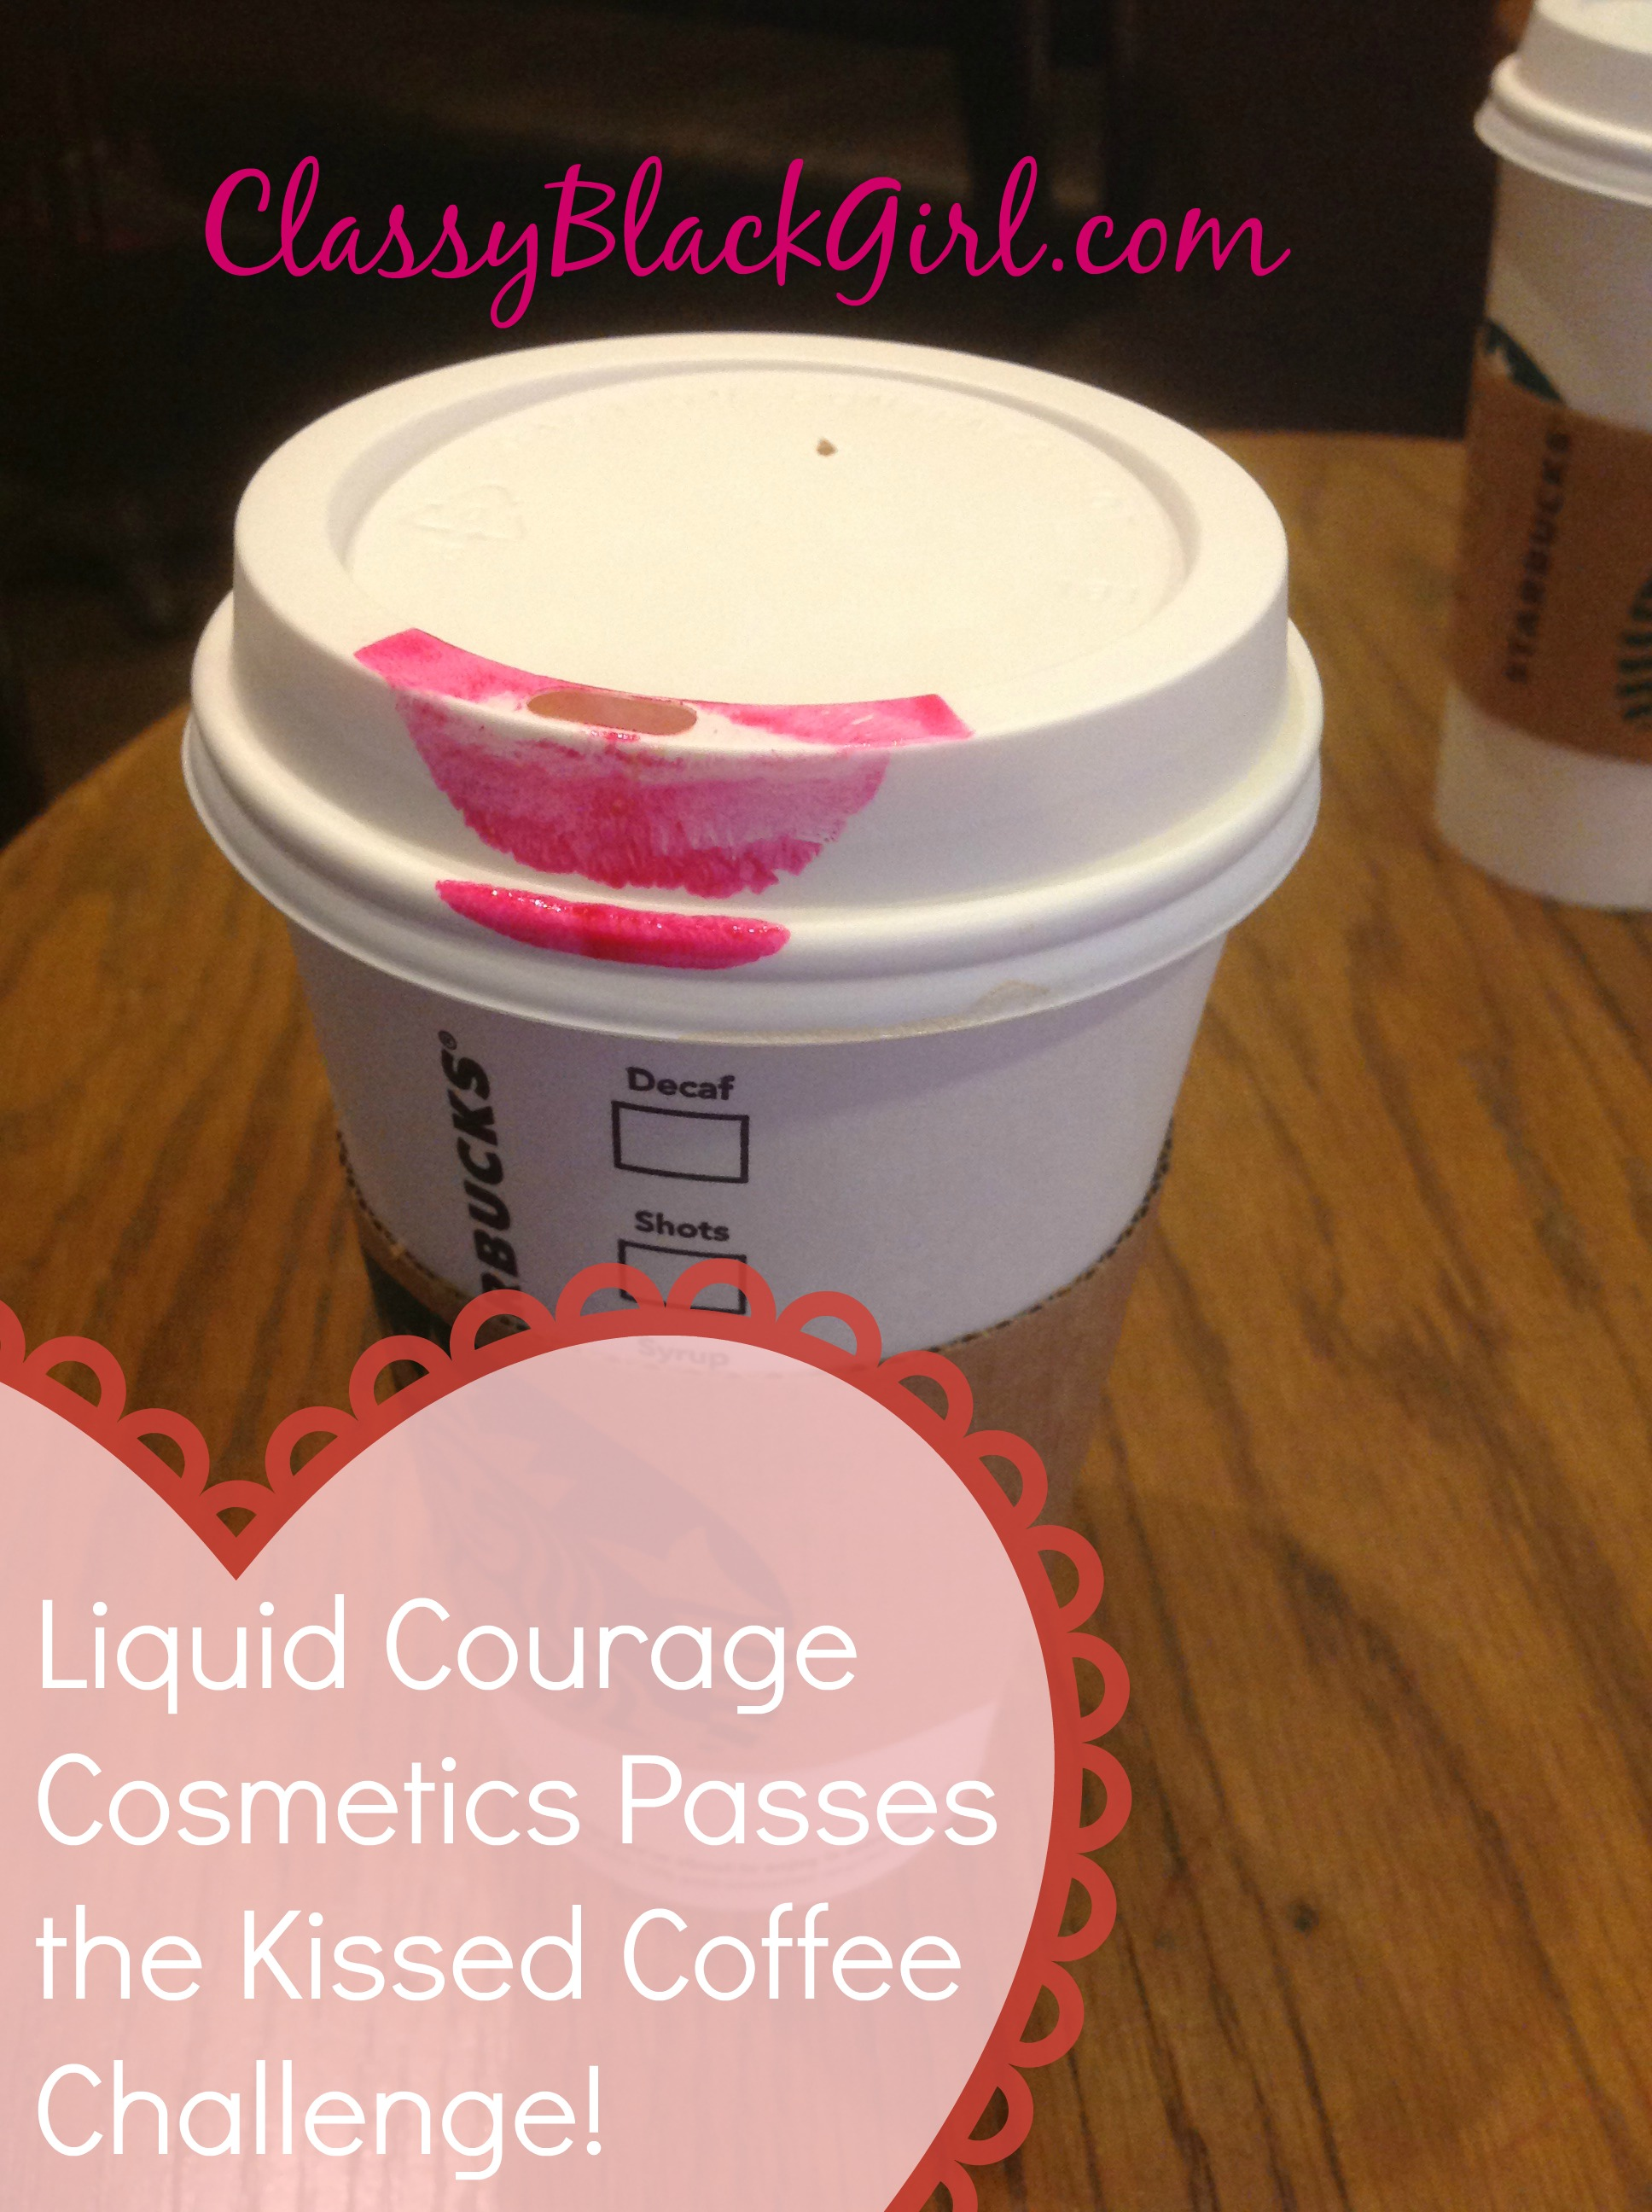 Classy Black Girl Liquid Courage Cosmetics Cherry on Top